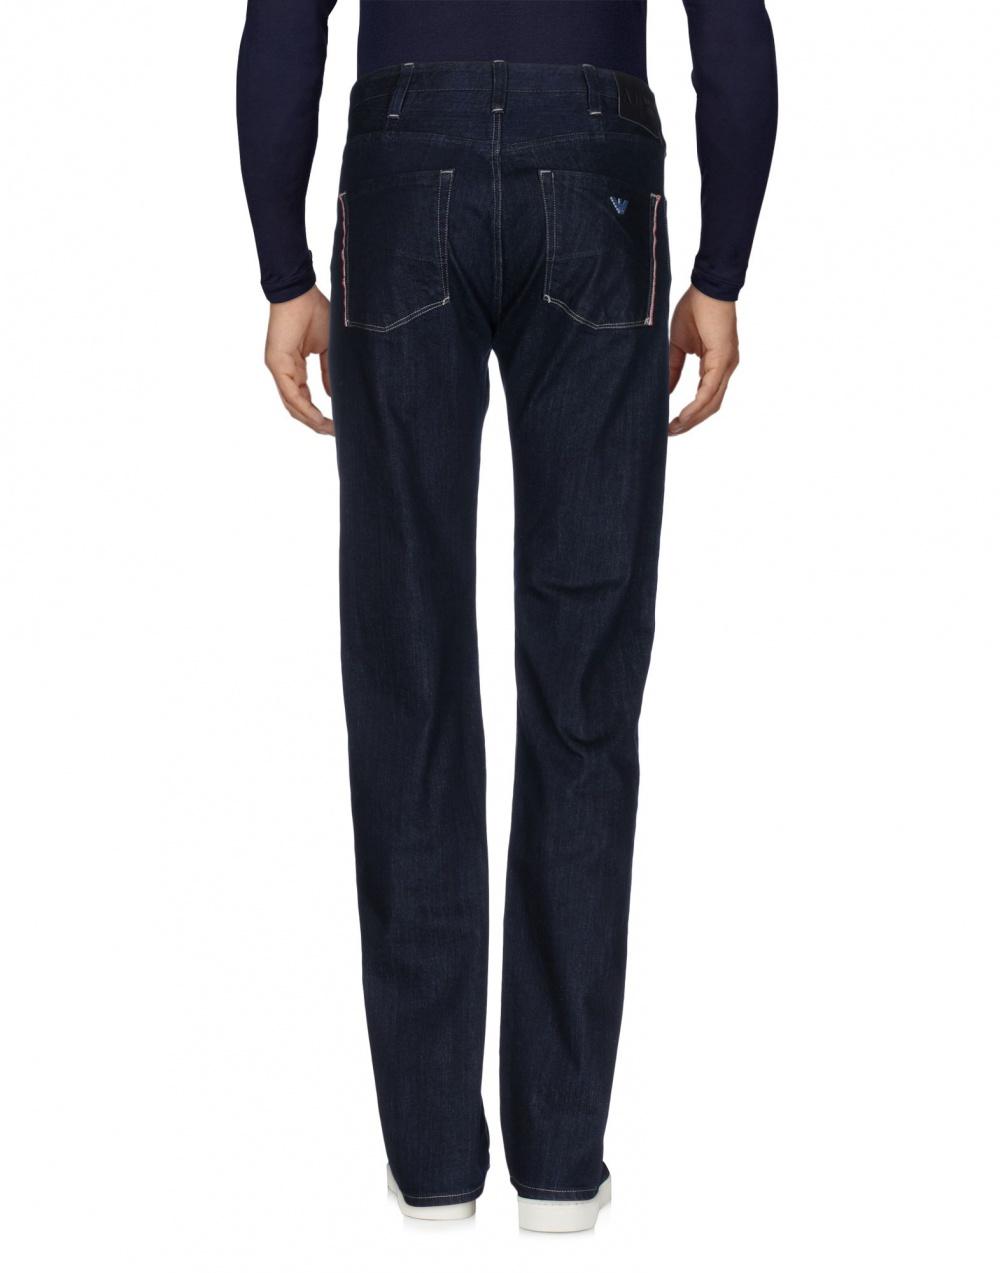 Мужские джинсовые брюки ARMANI JEANS, 30W-34L